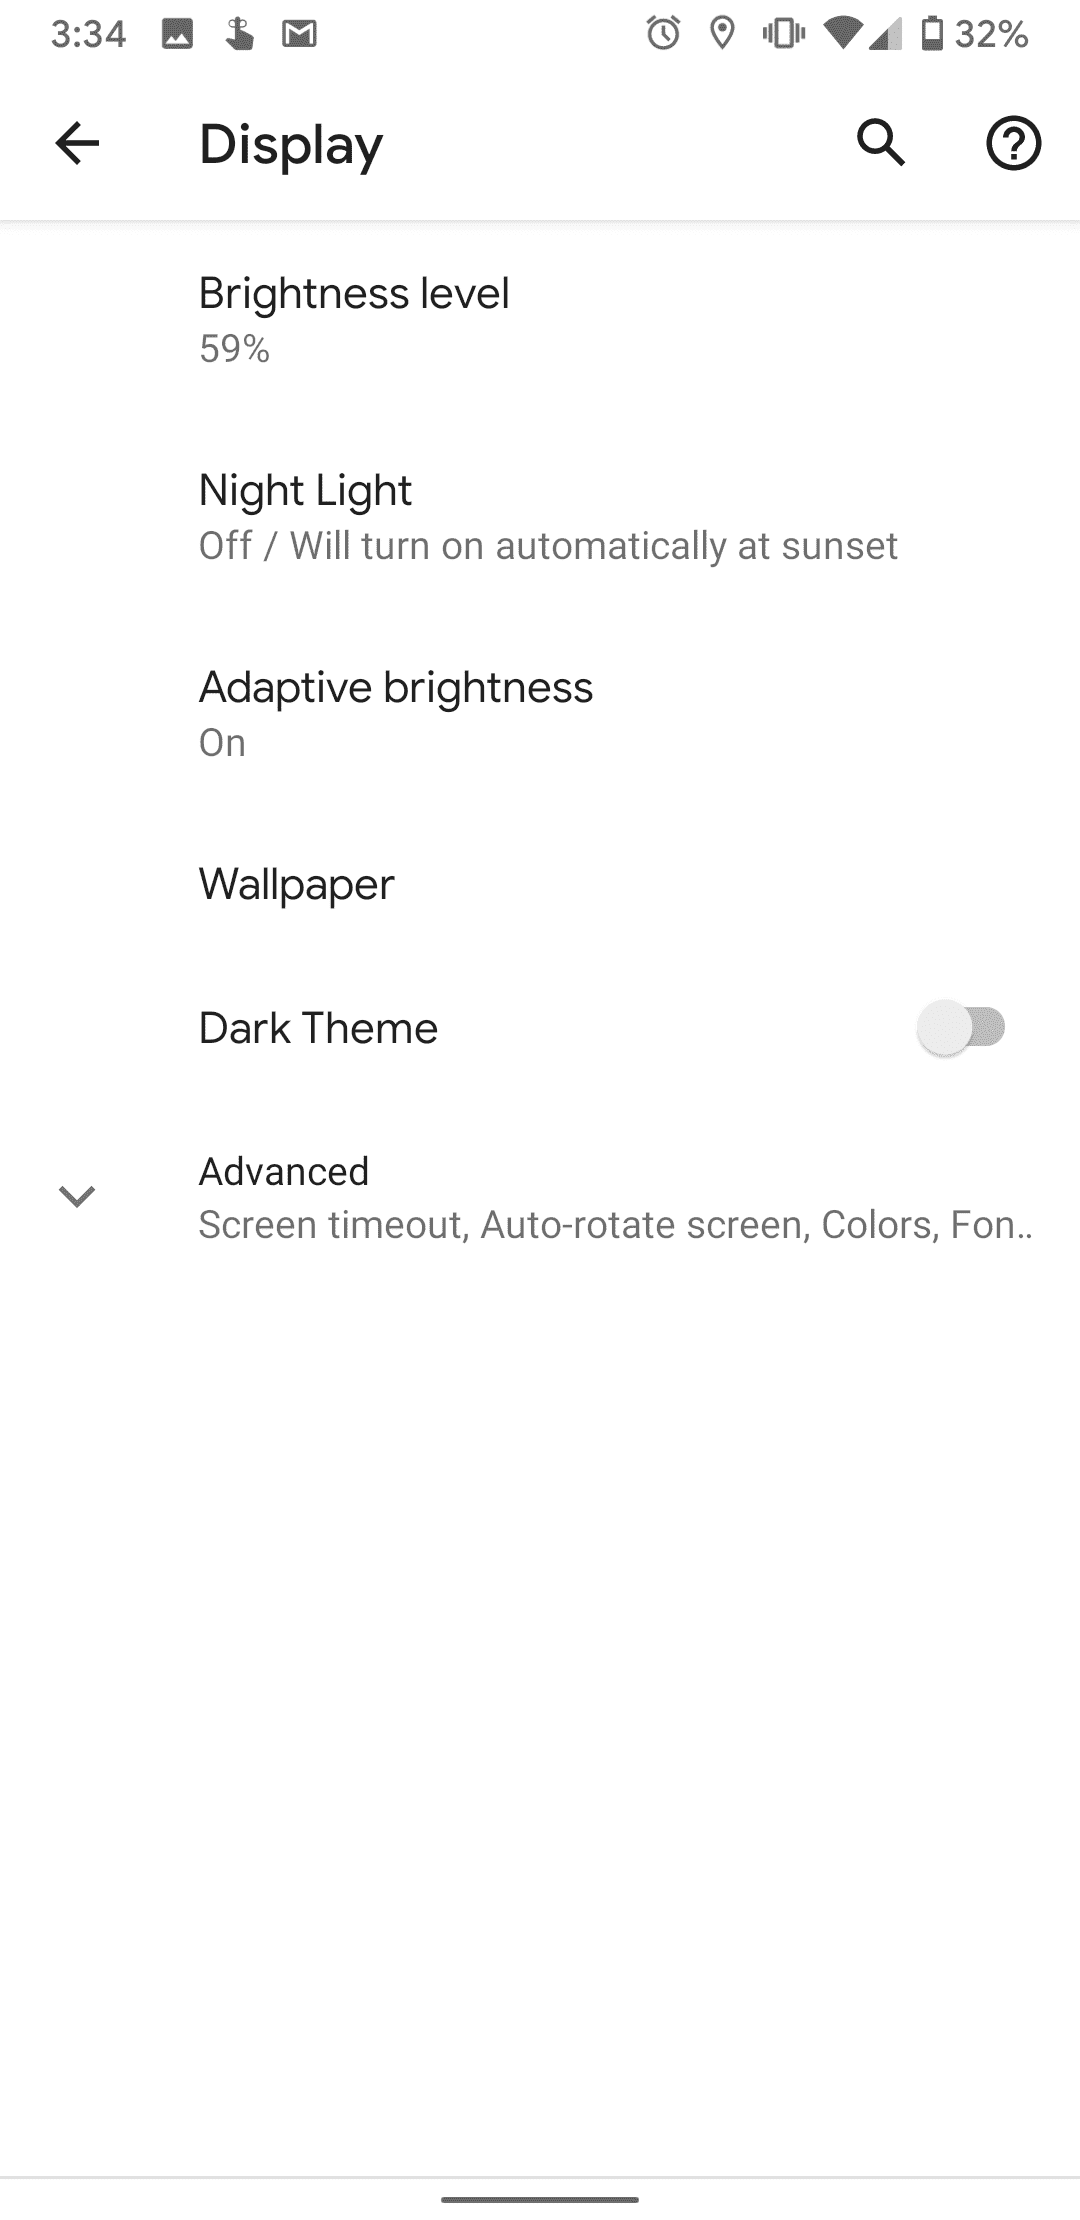 android q beta 4 dark theme switcher8423817226890915568